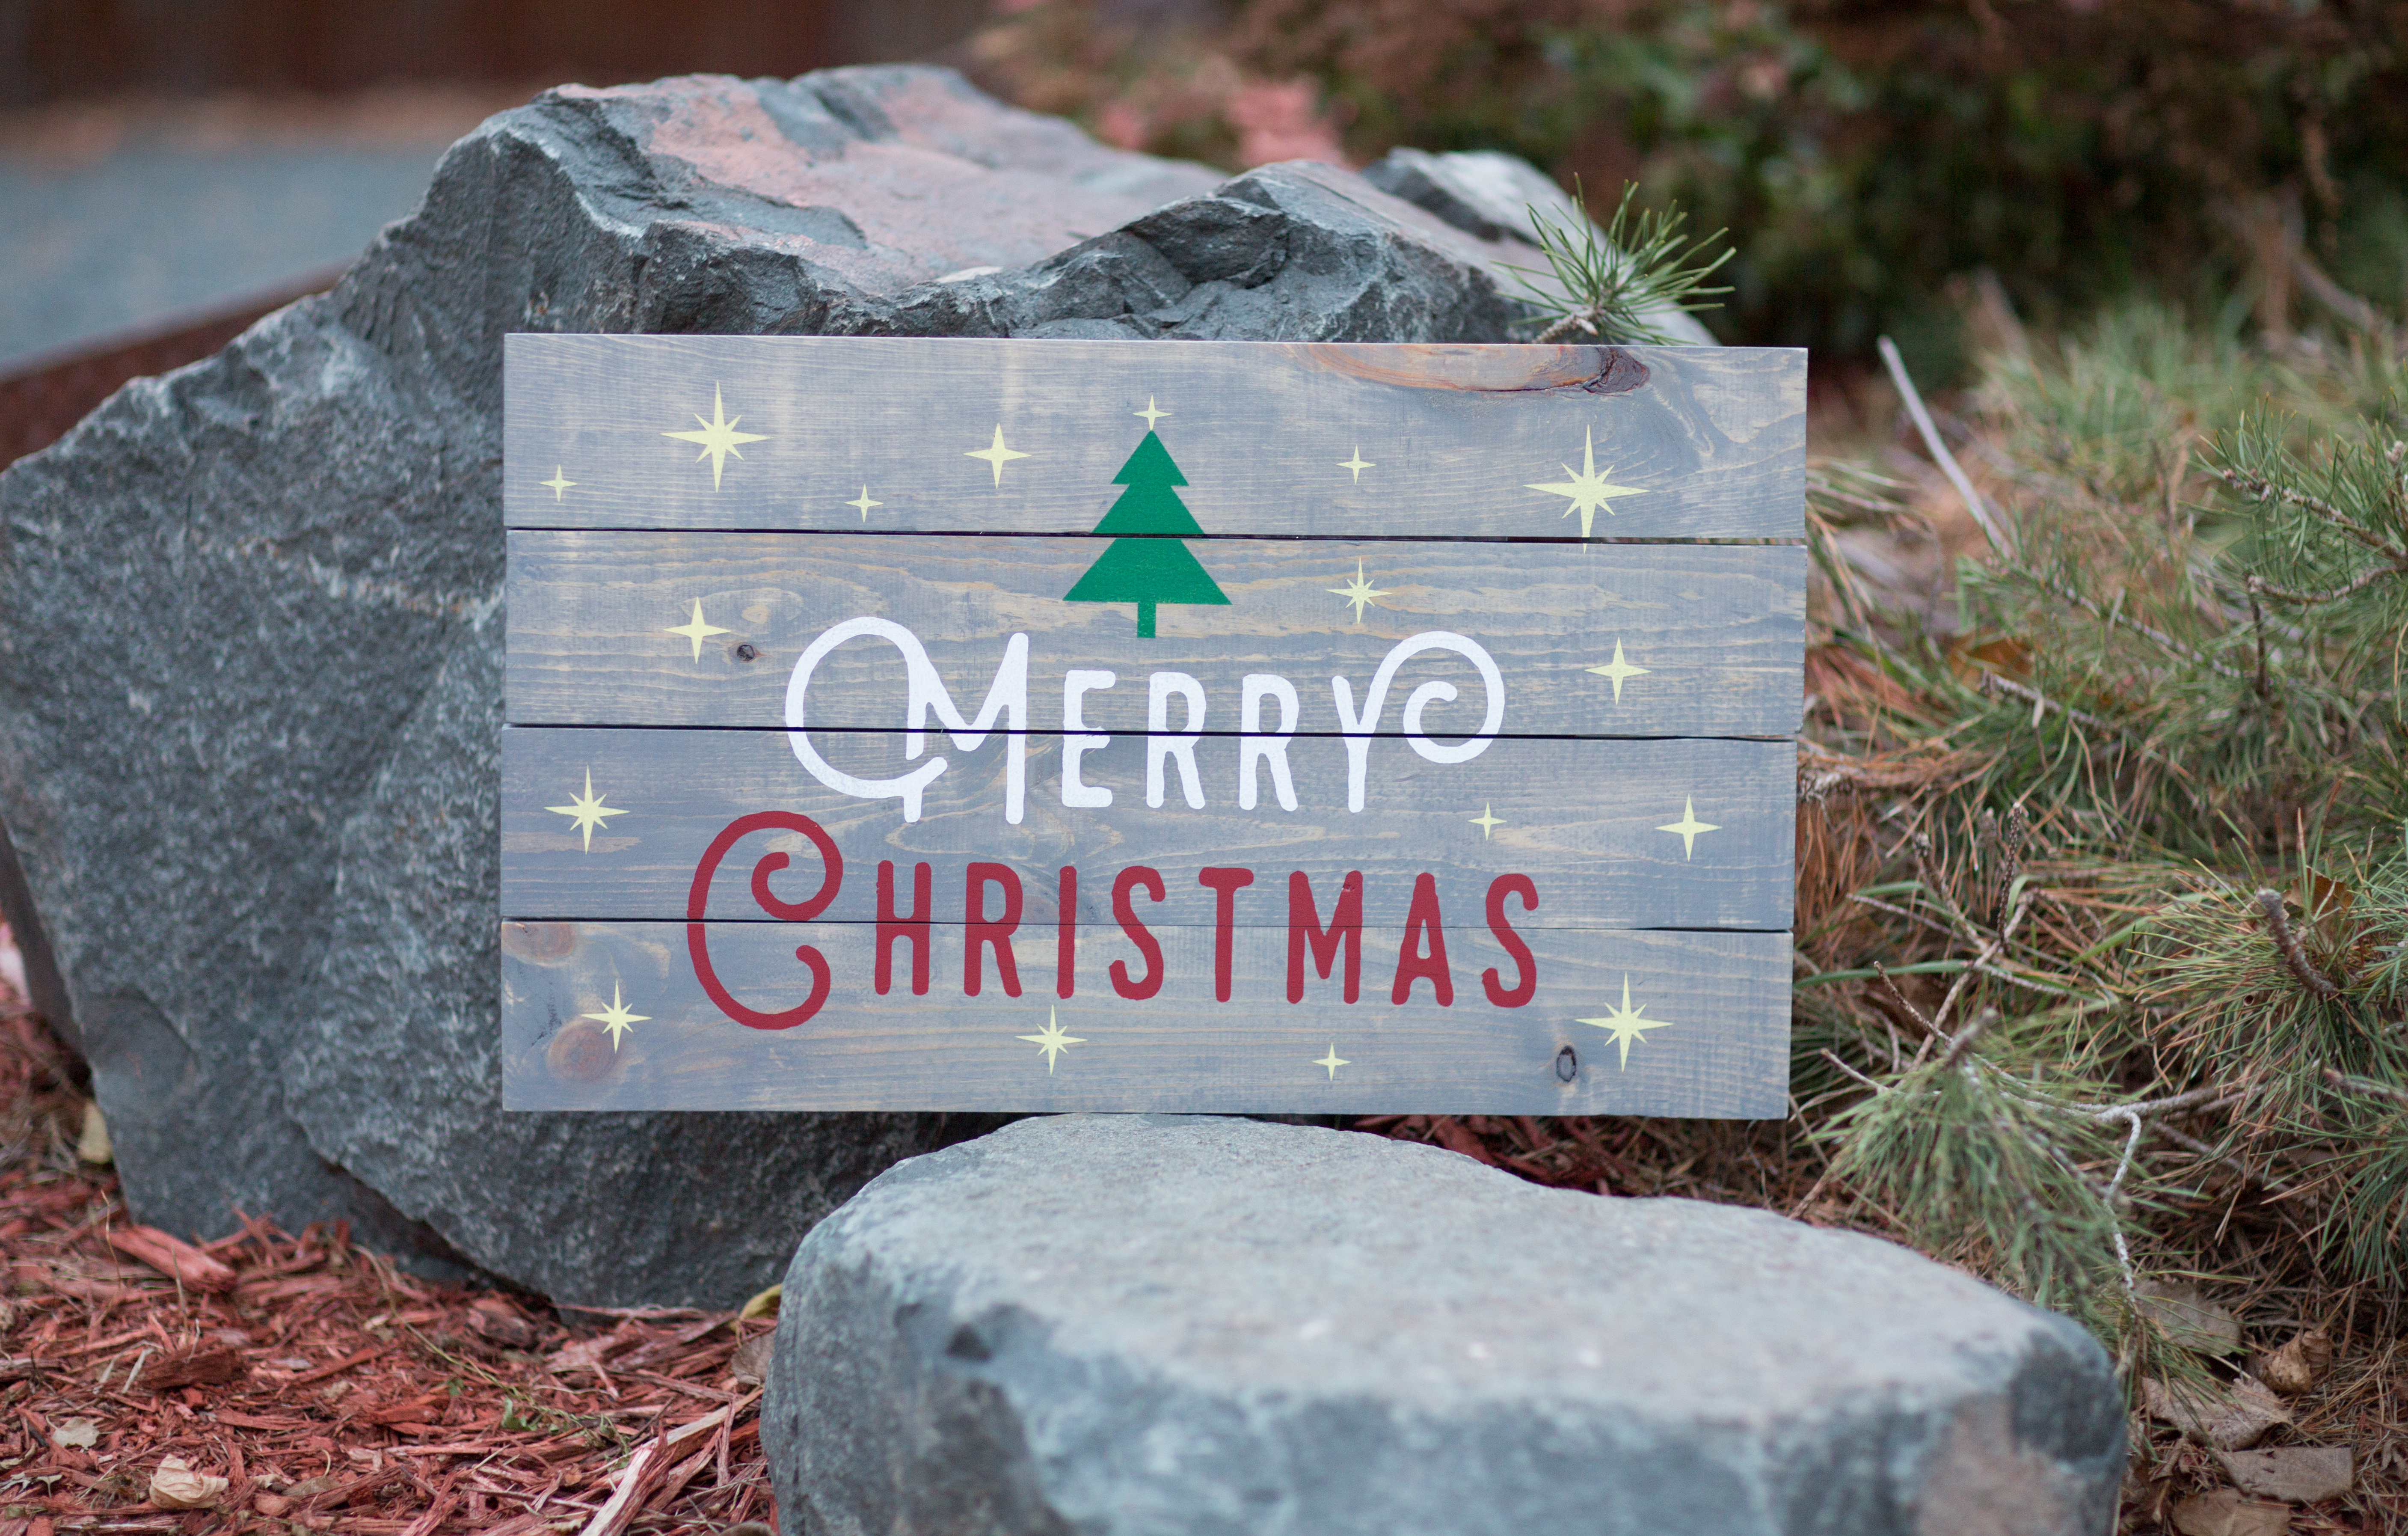 41) Merry Christmas